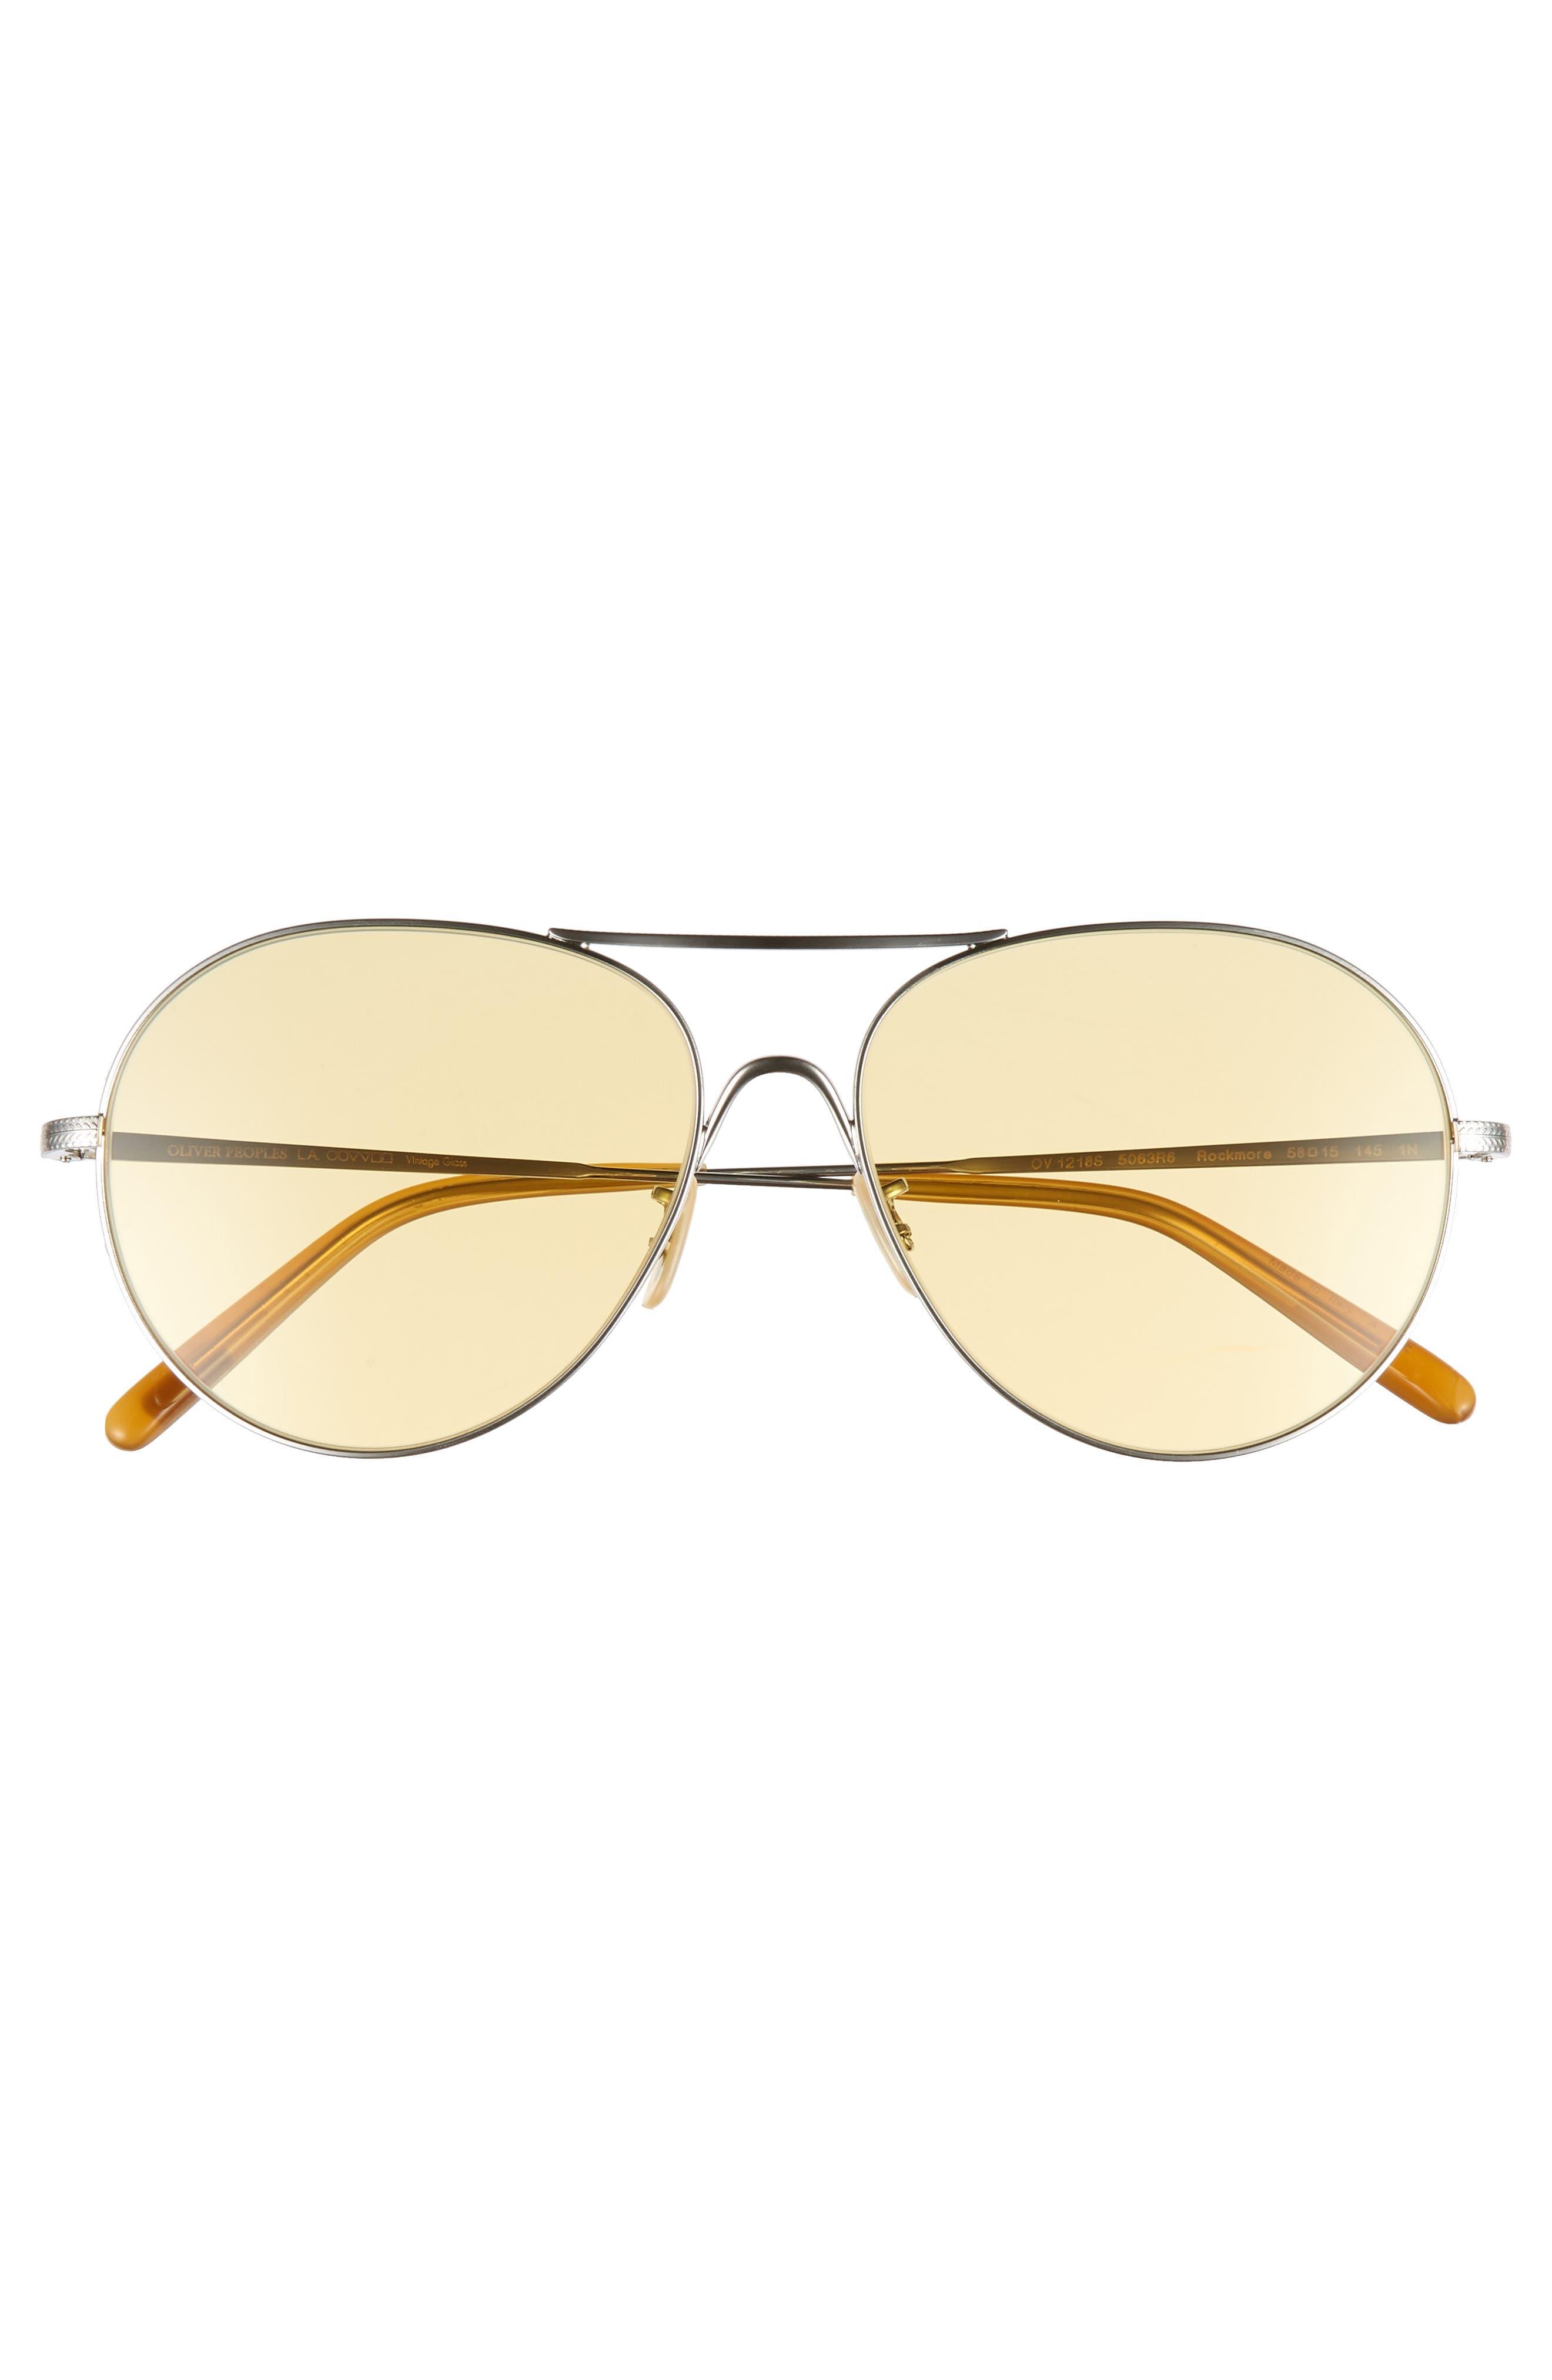 Rockmore 58mm Aviator Sunglasses,                             Alternate thumbnail 3, color,                             SILVER